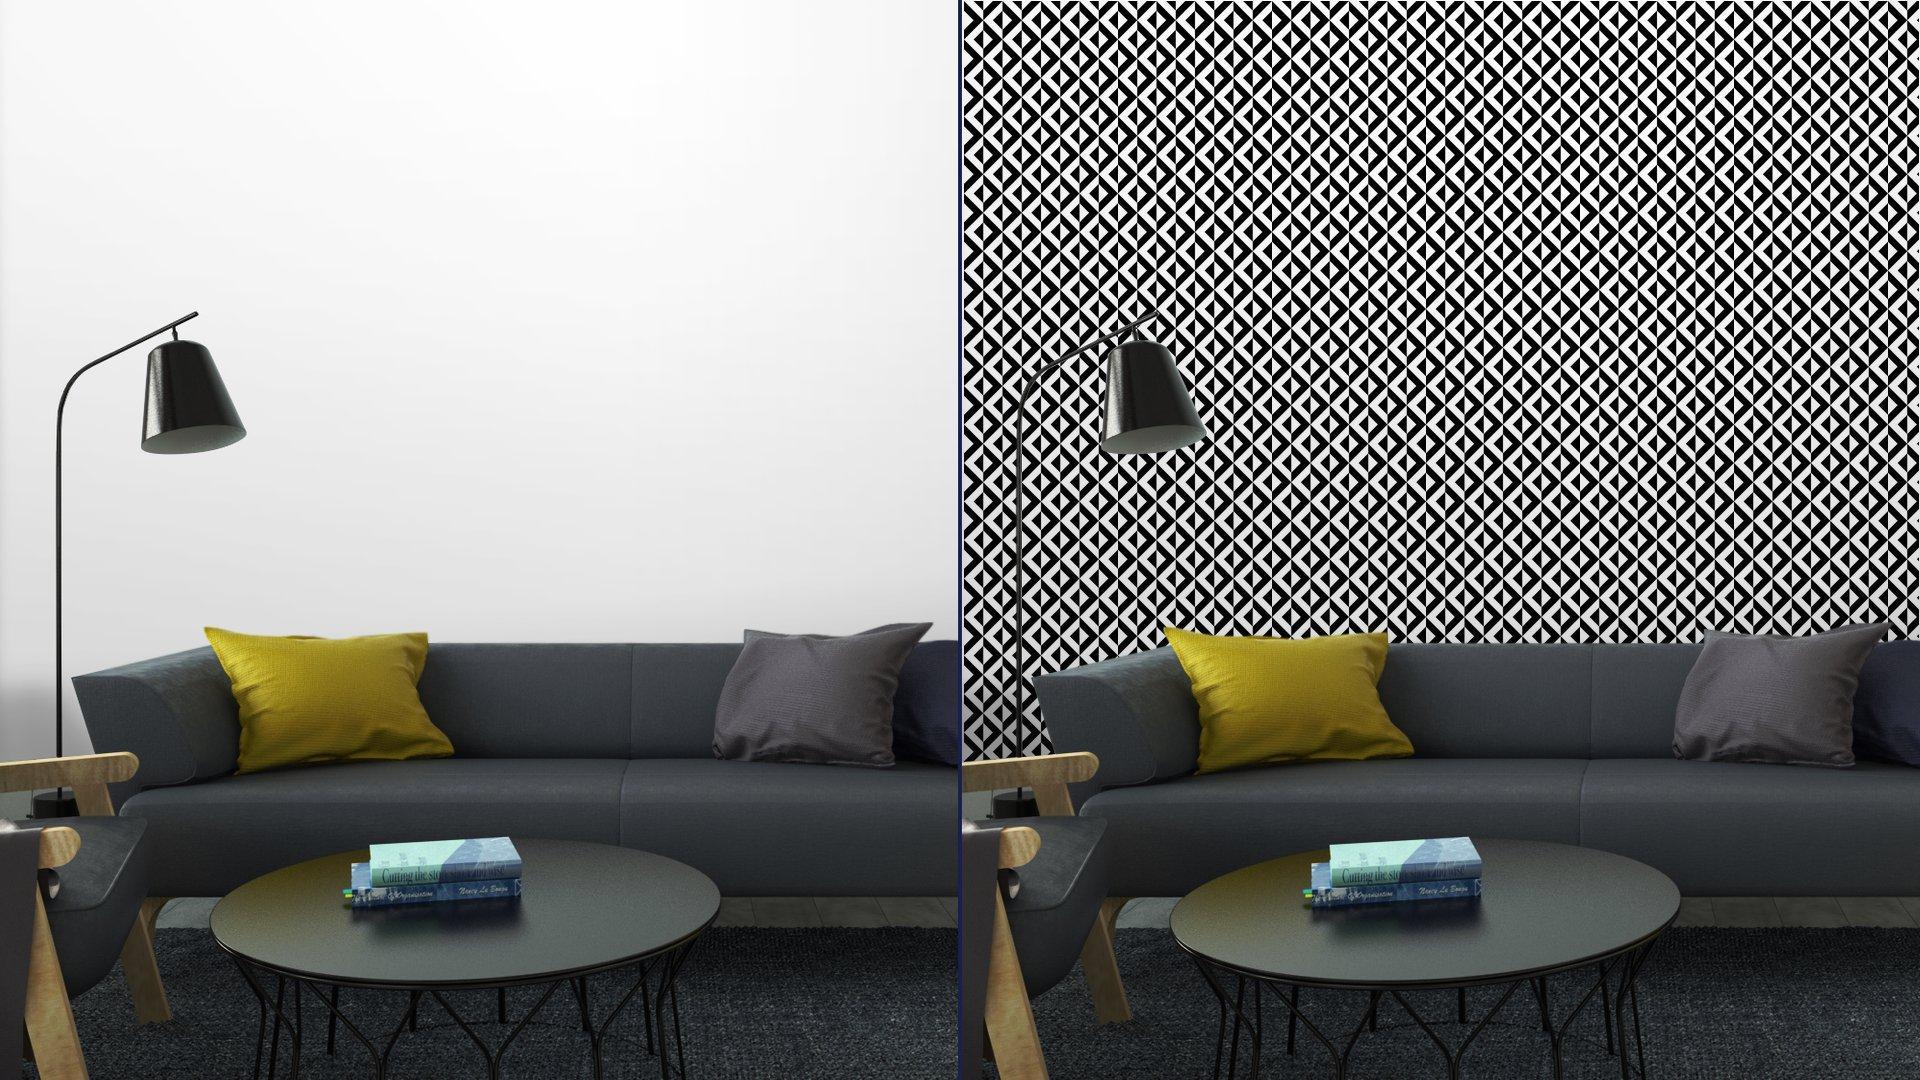 Fotomurales mexico papeles pintados patron geometrico abstracto 5 - Papel Tapiz Geométrico Blanco y Negro 01